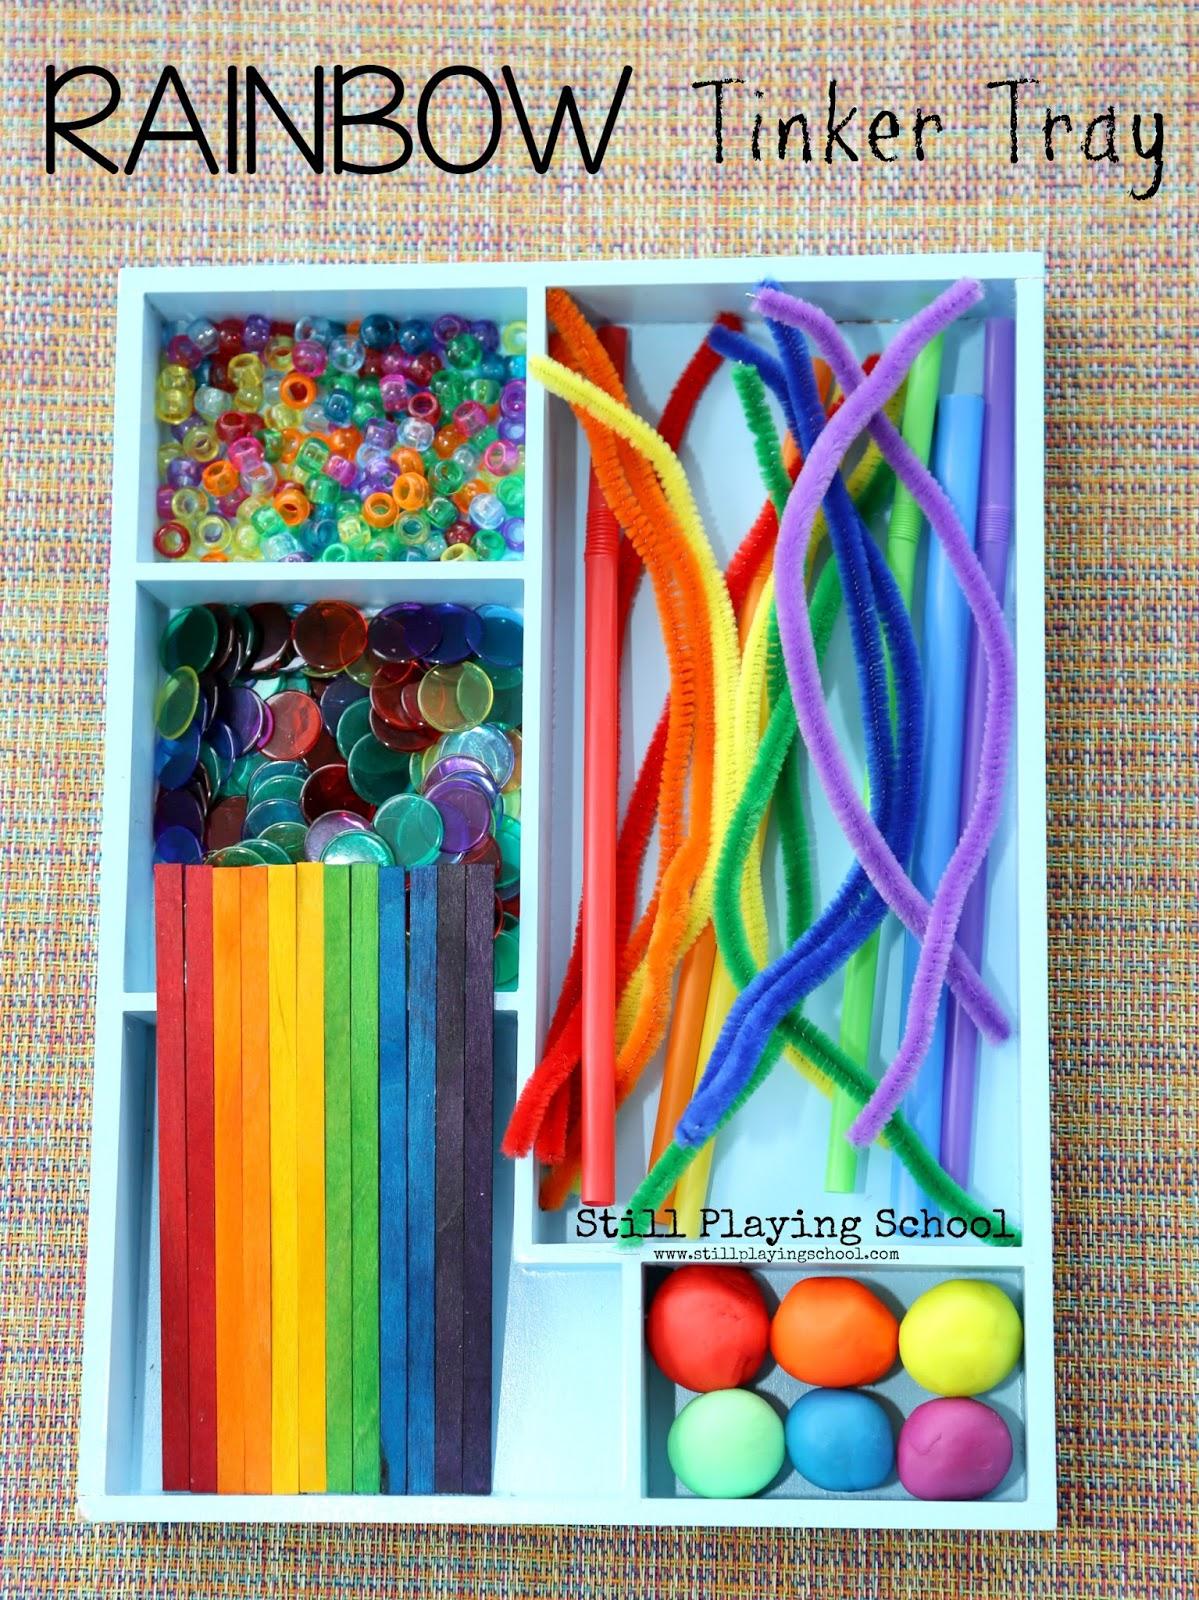 Rainbow Tinker Tray  Still Playing School